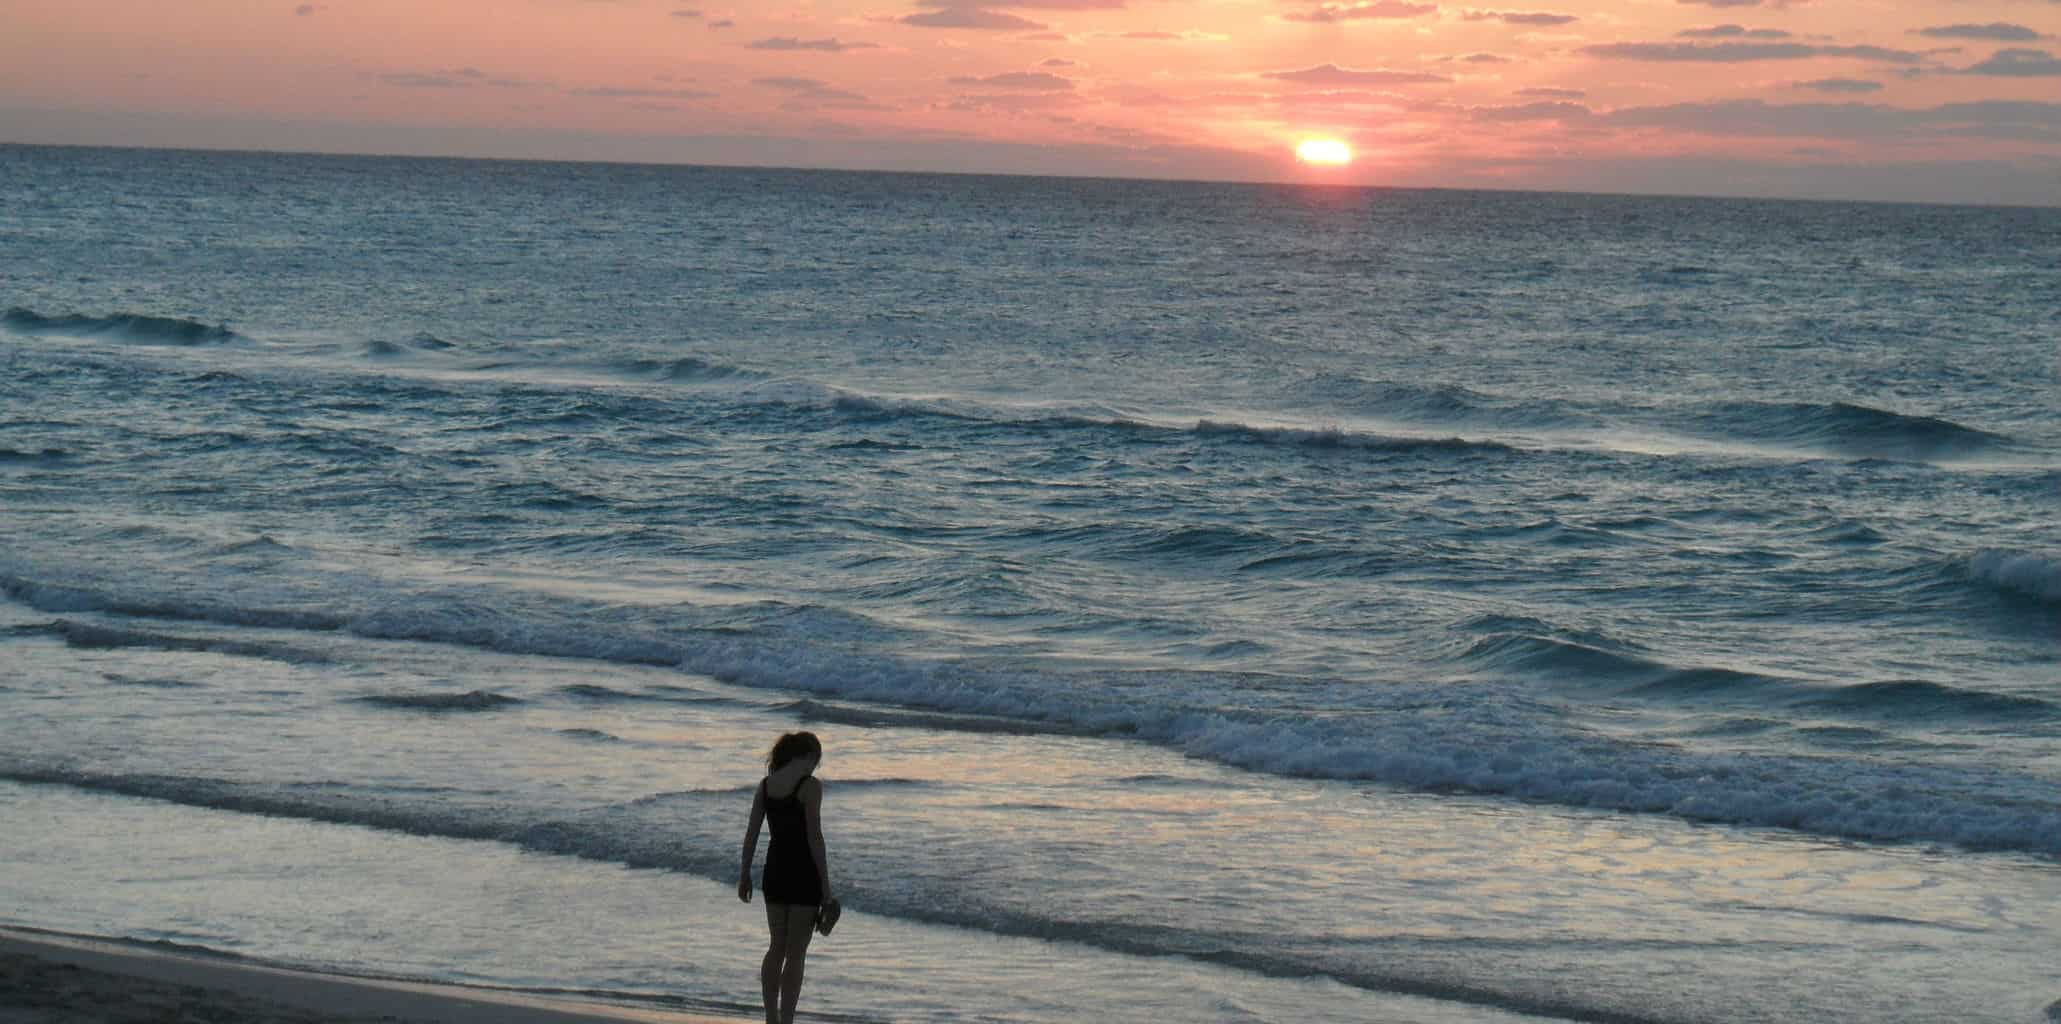 zzc Last sunset in Cuba